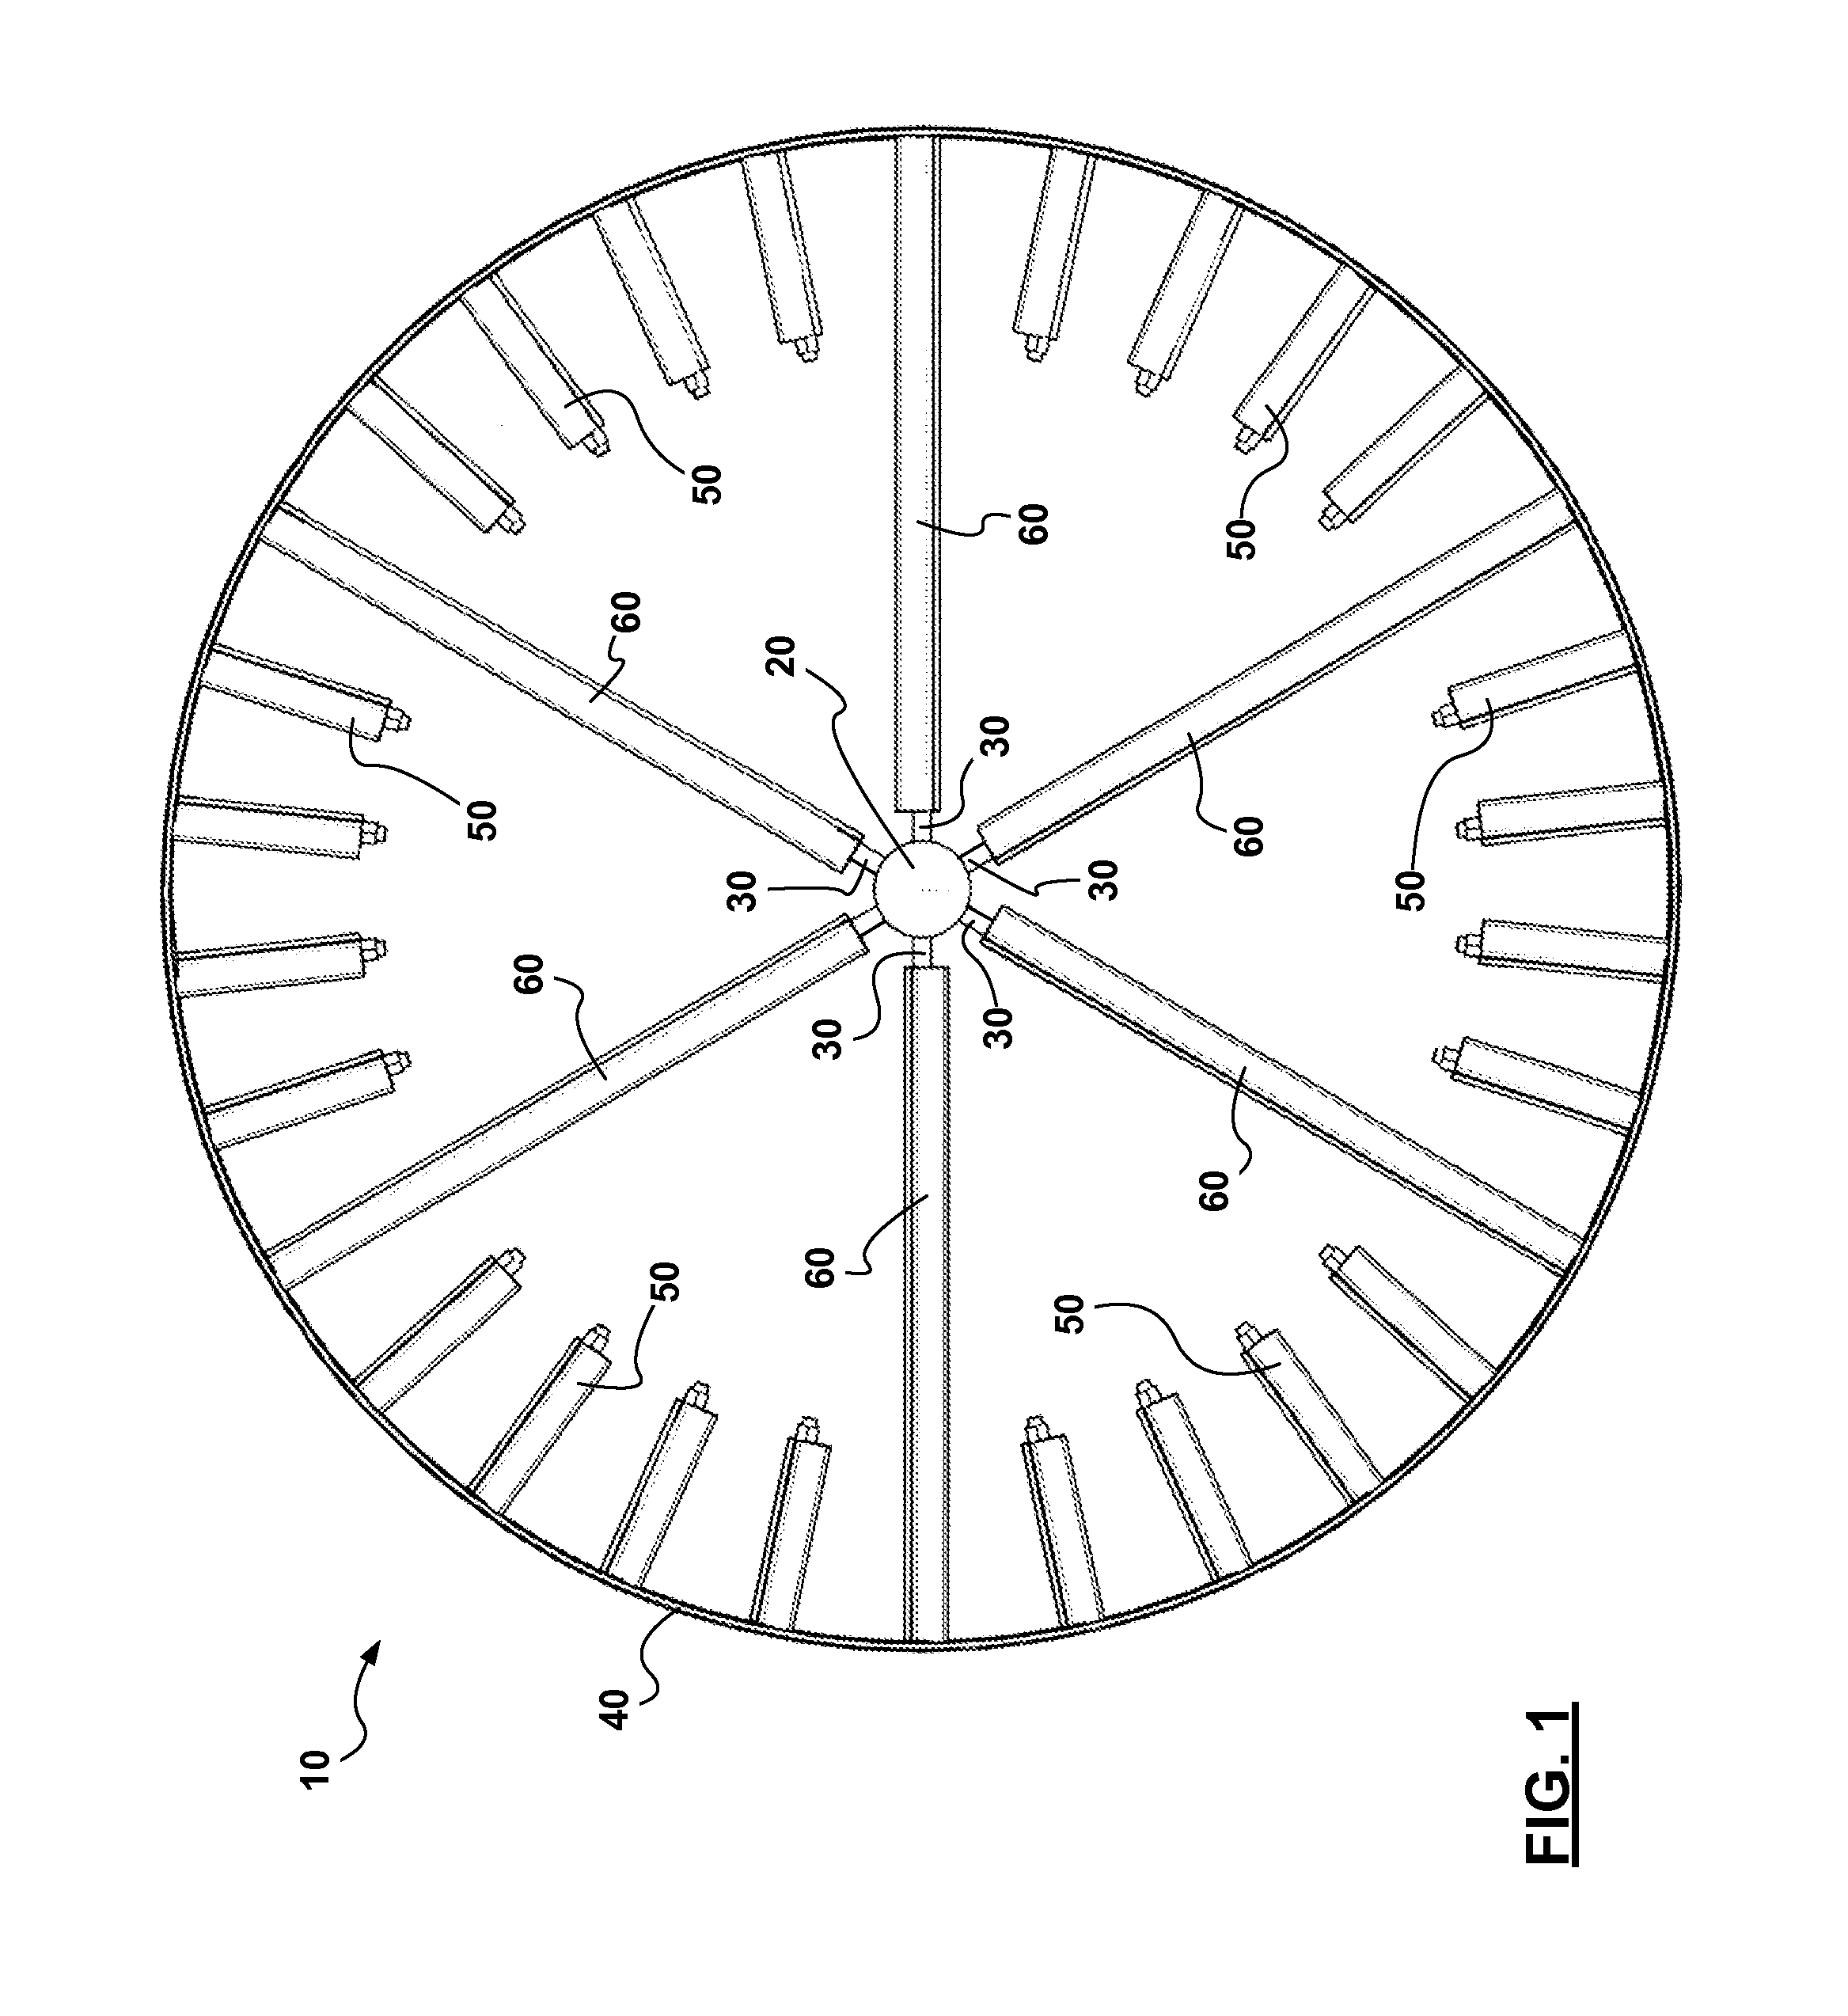 patent us20120213636 - horizontal axis airfoil turbine